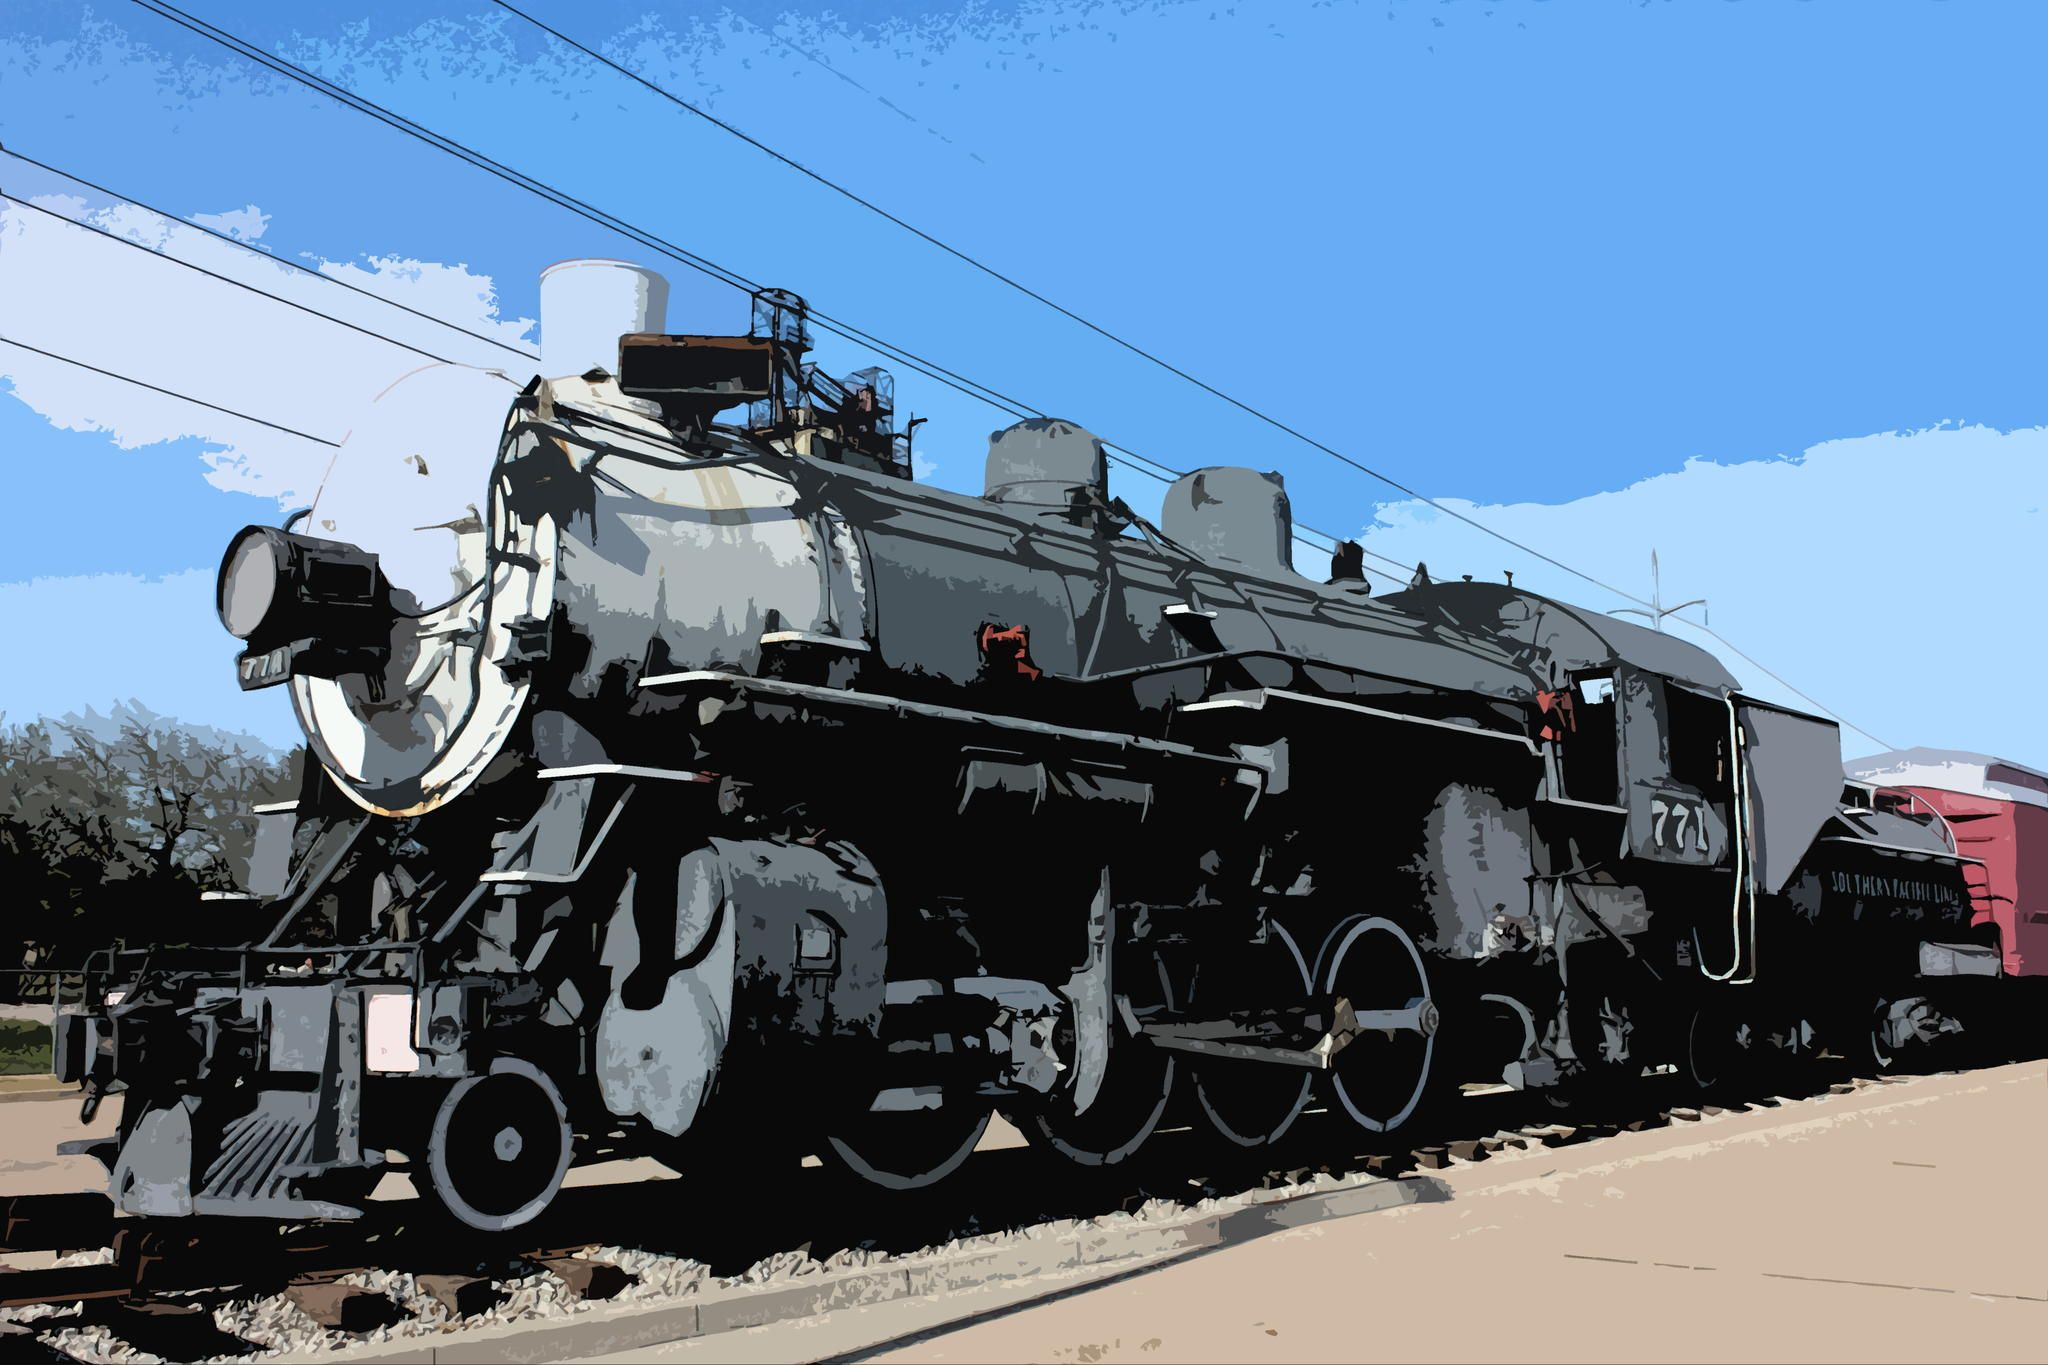 Vintage Train by Jason W. Crews on 500px